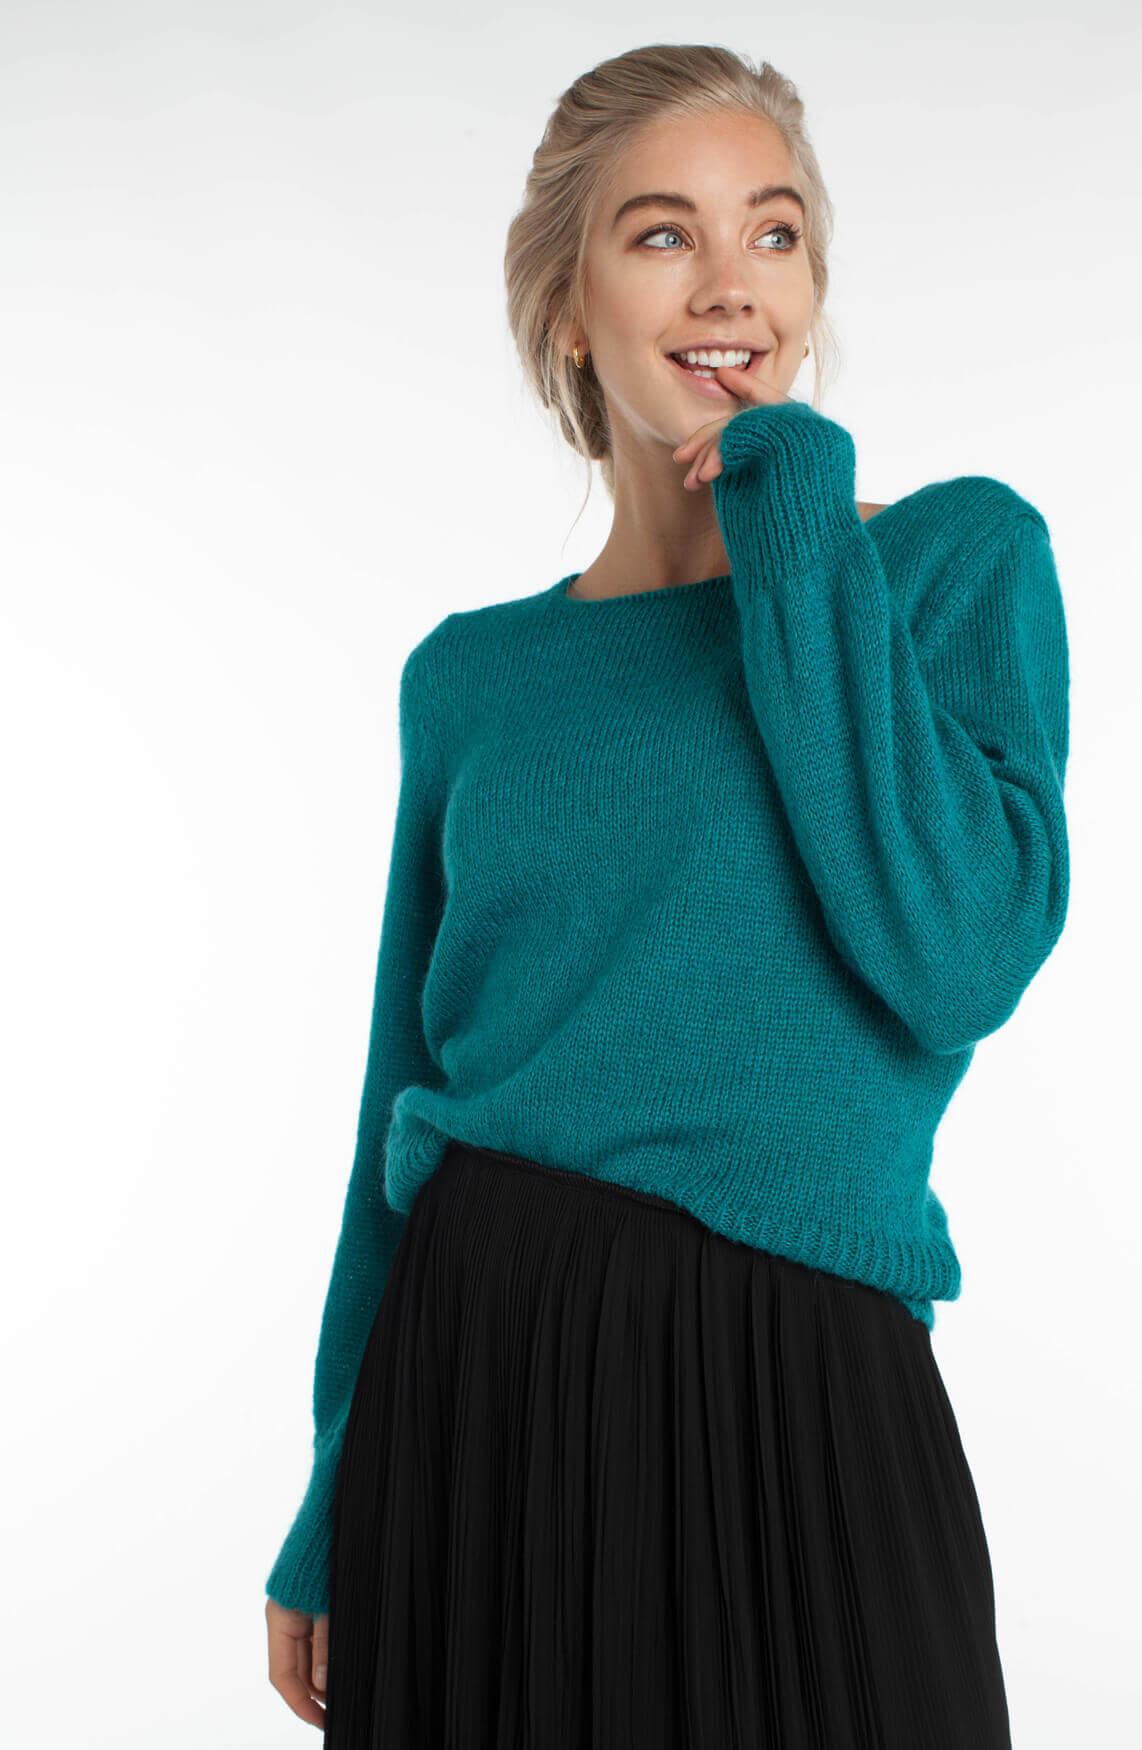 La Fée Maraboutée Dames Pullover met boothals groen